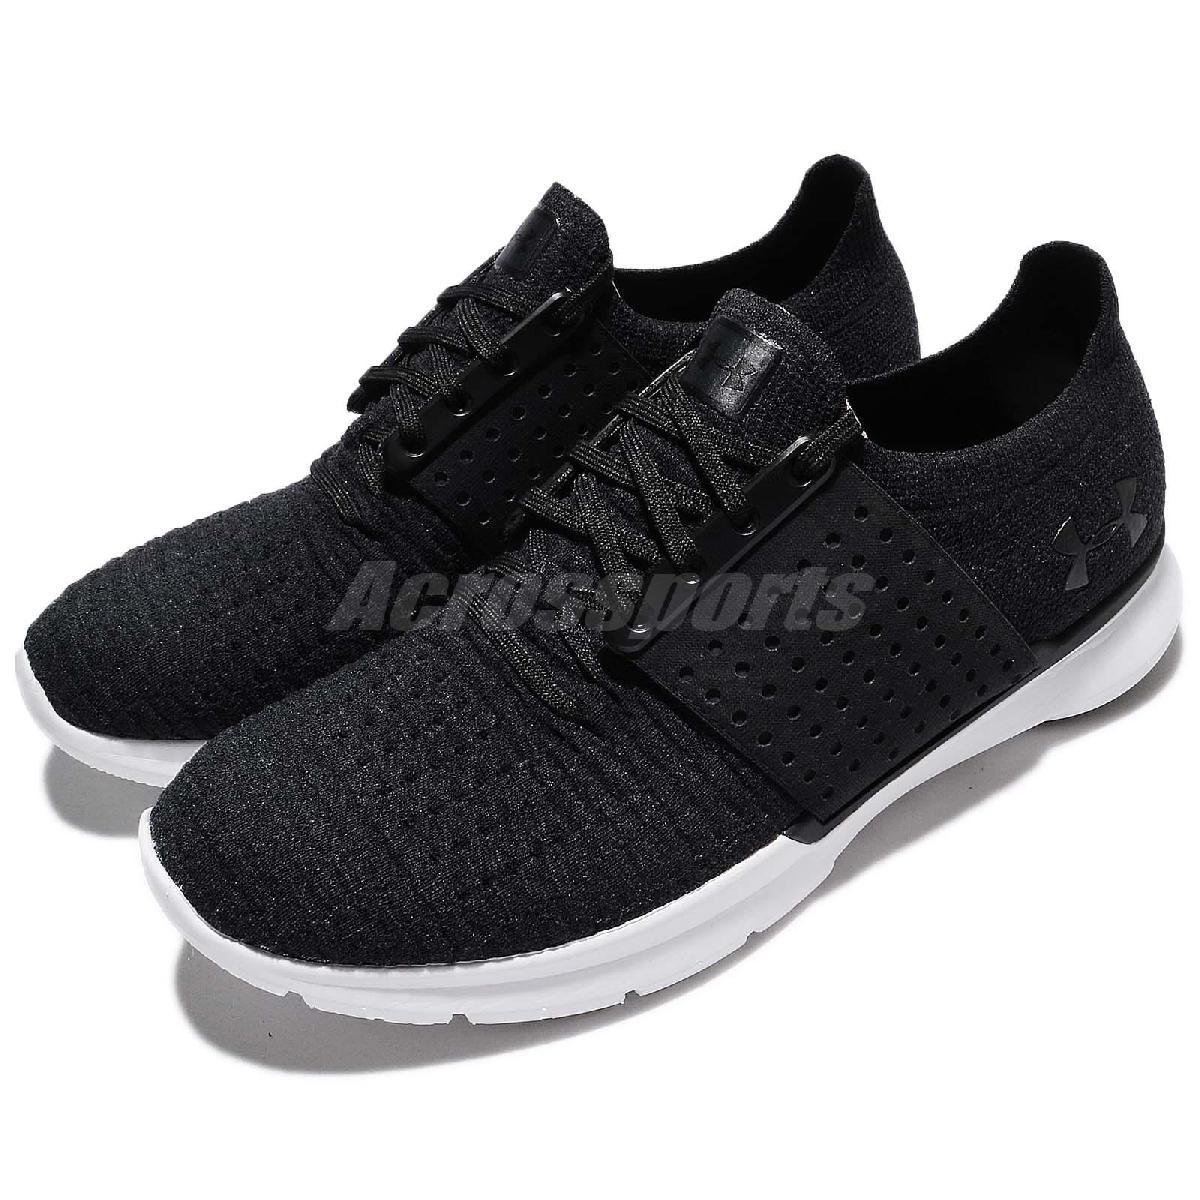 Under Armour UA慢跑鞋Slingwrap黑白運動鞋基本款黑白男鞋PUMP306 1295724001